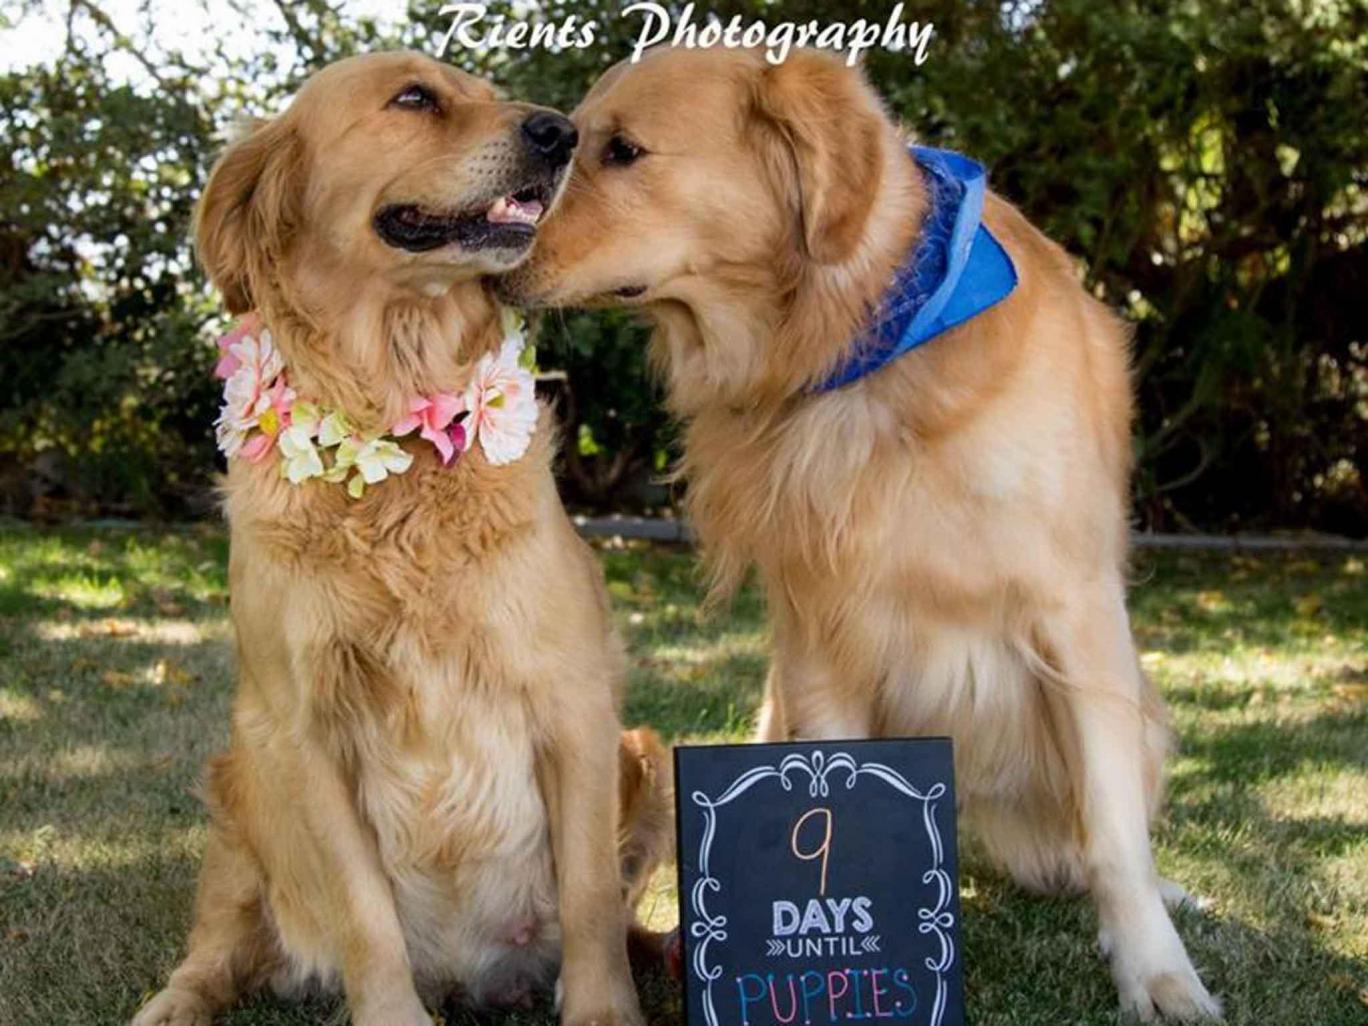 Cuki fotósorozatot kapott a terhes kutya